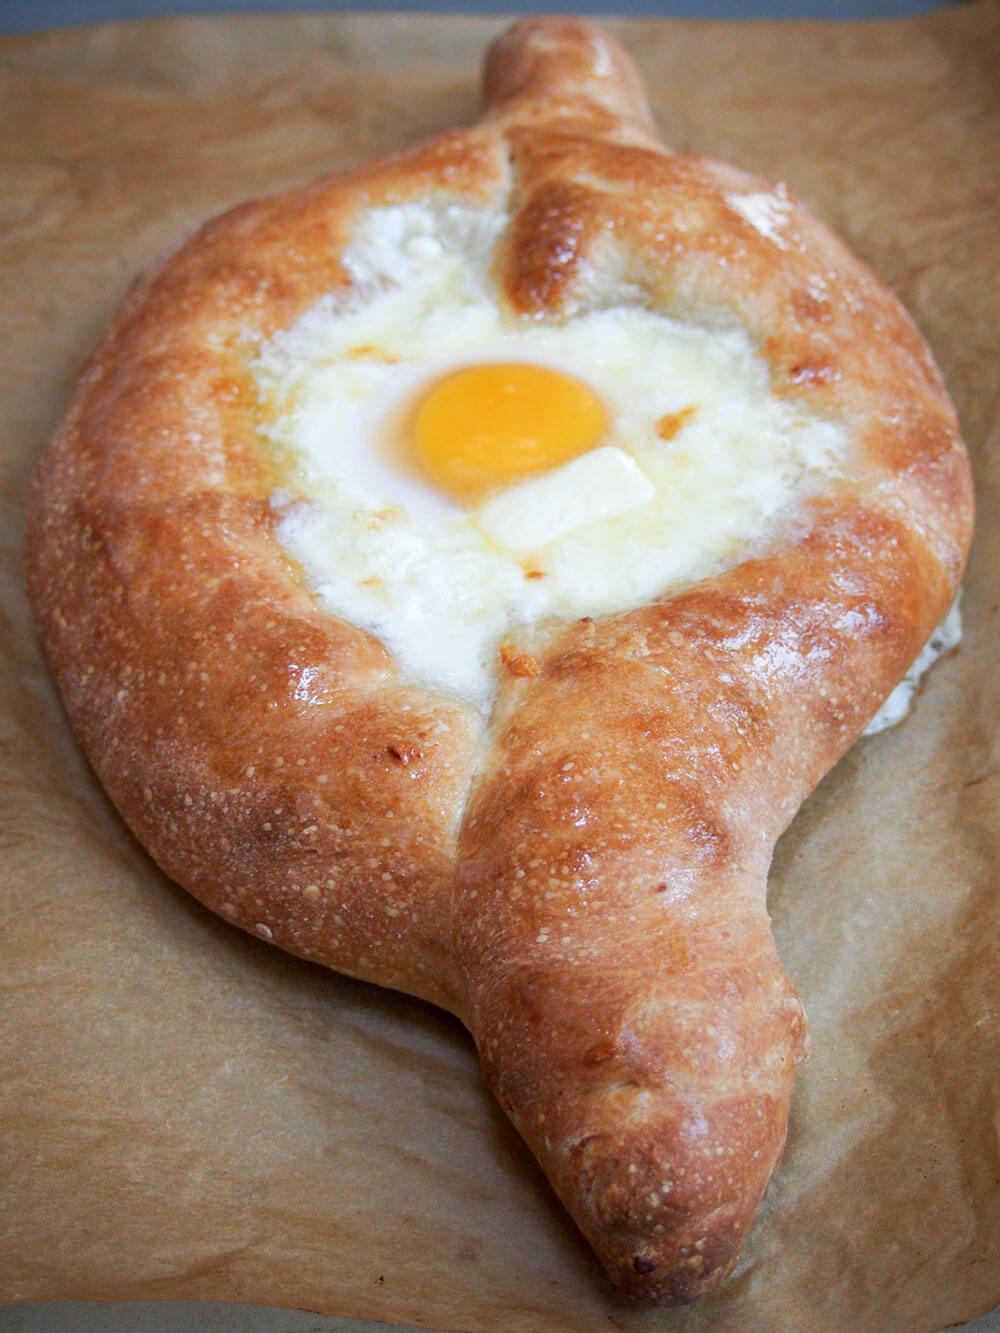 Adjaruli khachapuri Georgian cheese bread with butter added to middle